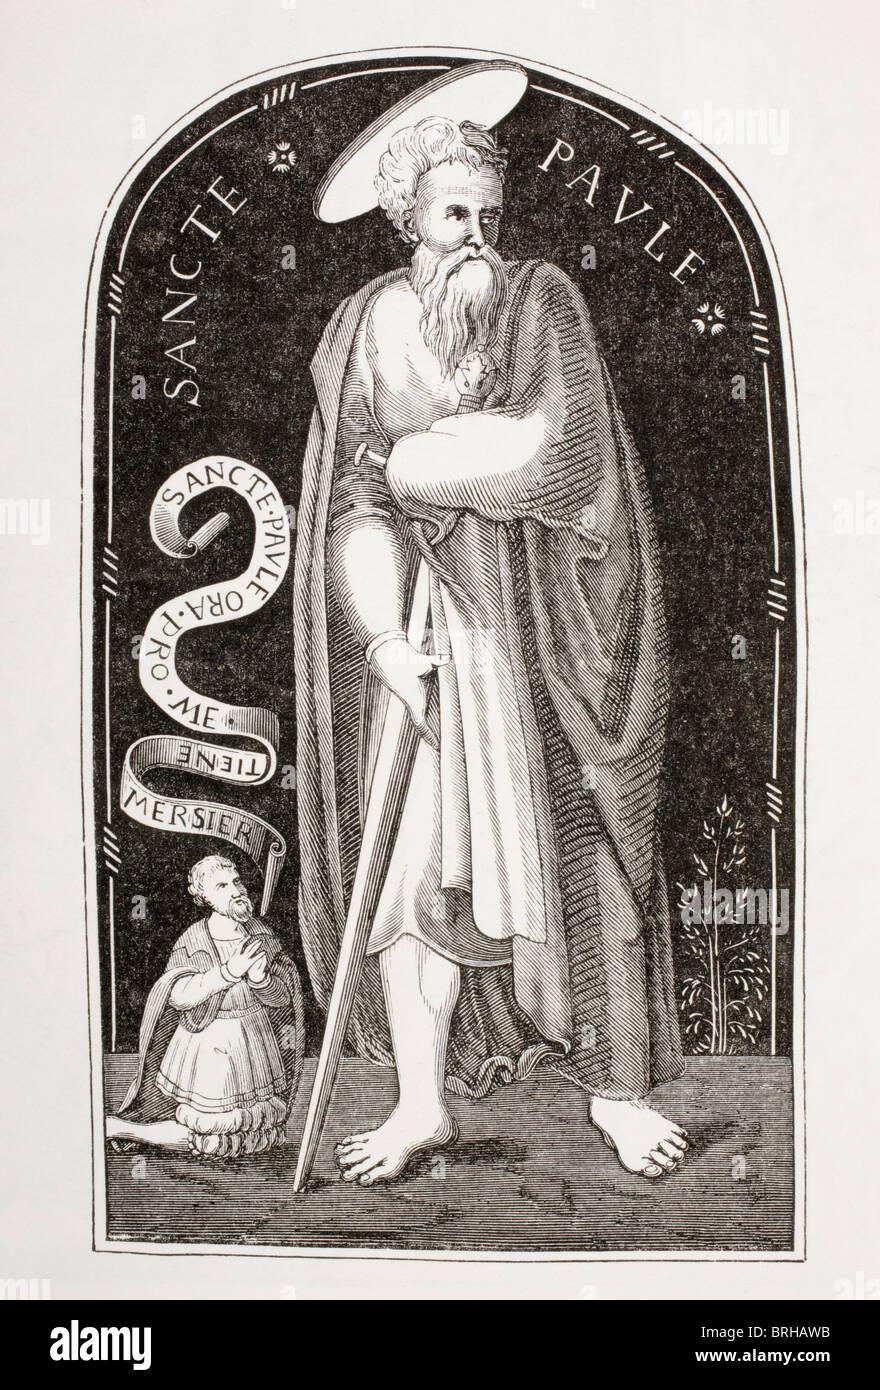 Saint Paul. Paul of Tarsus. Paul the Apostle. - Stock Image